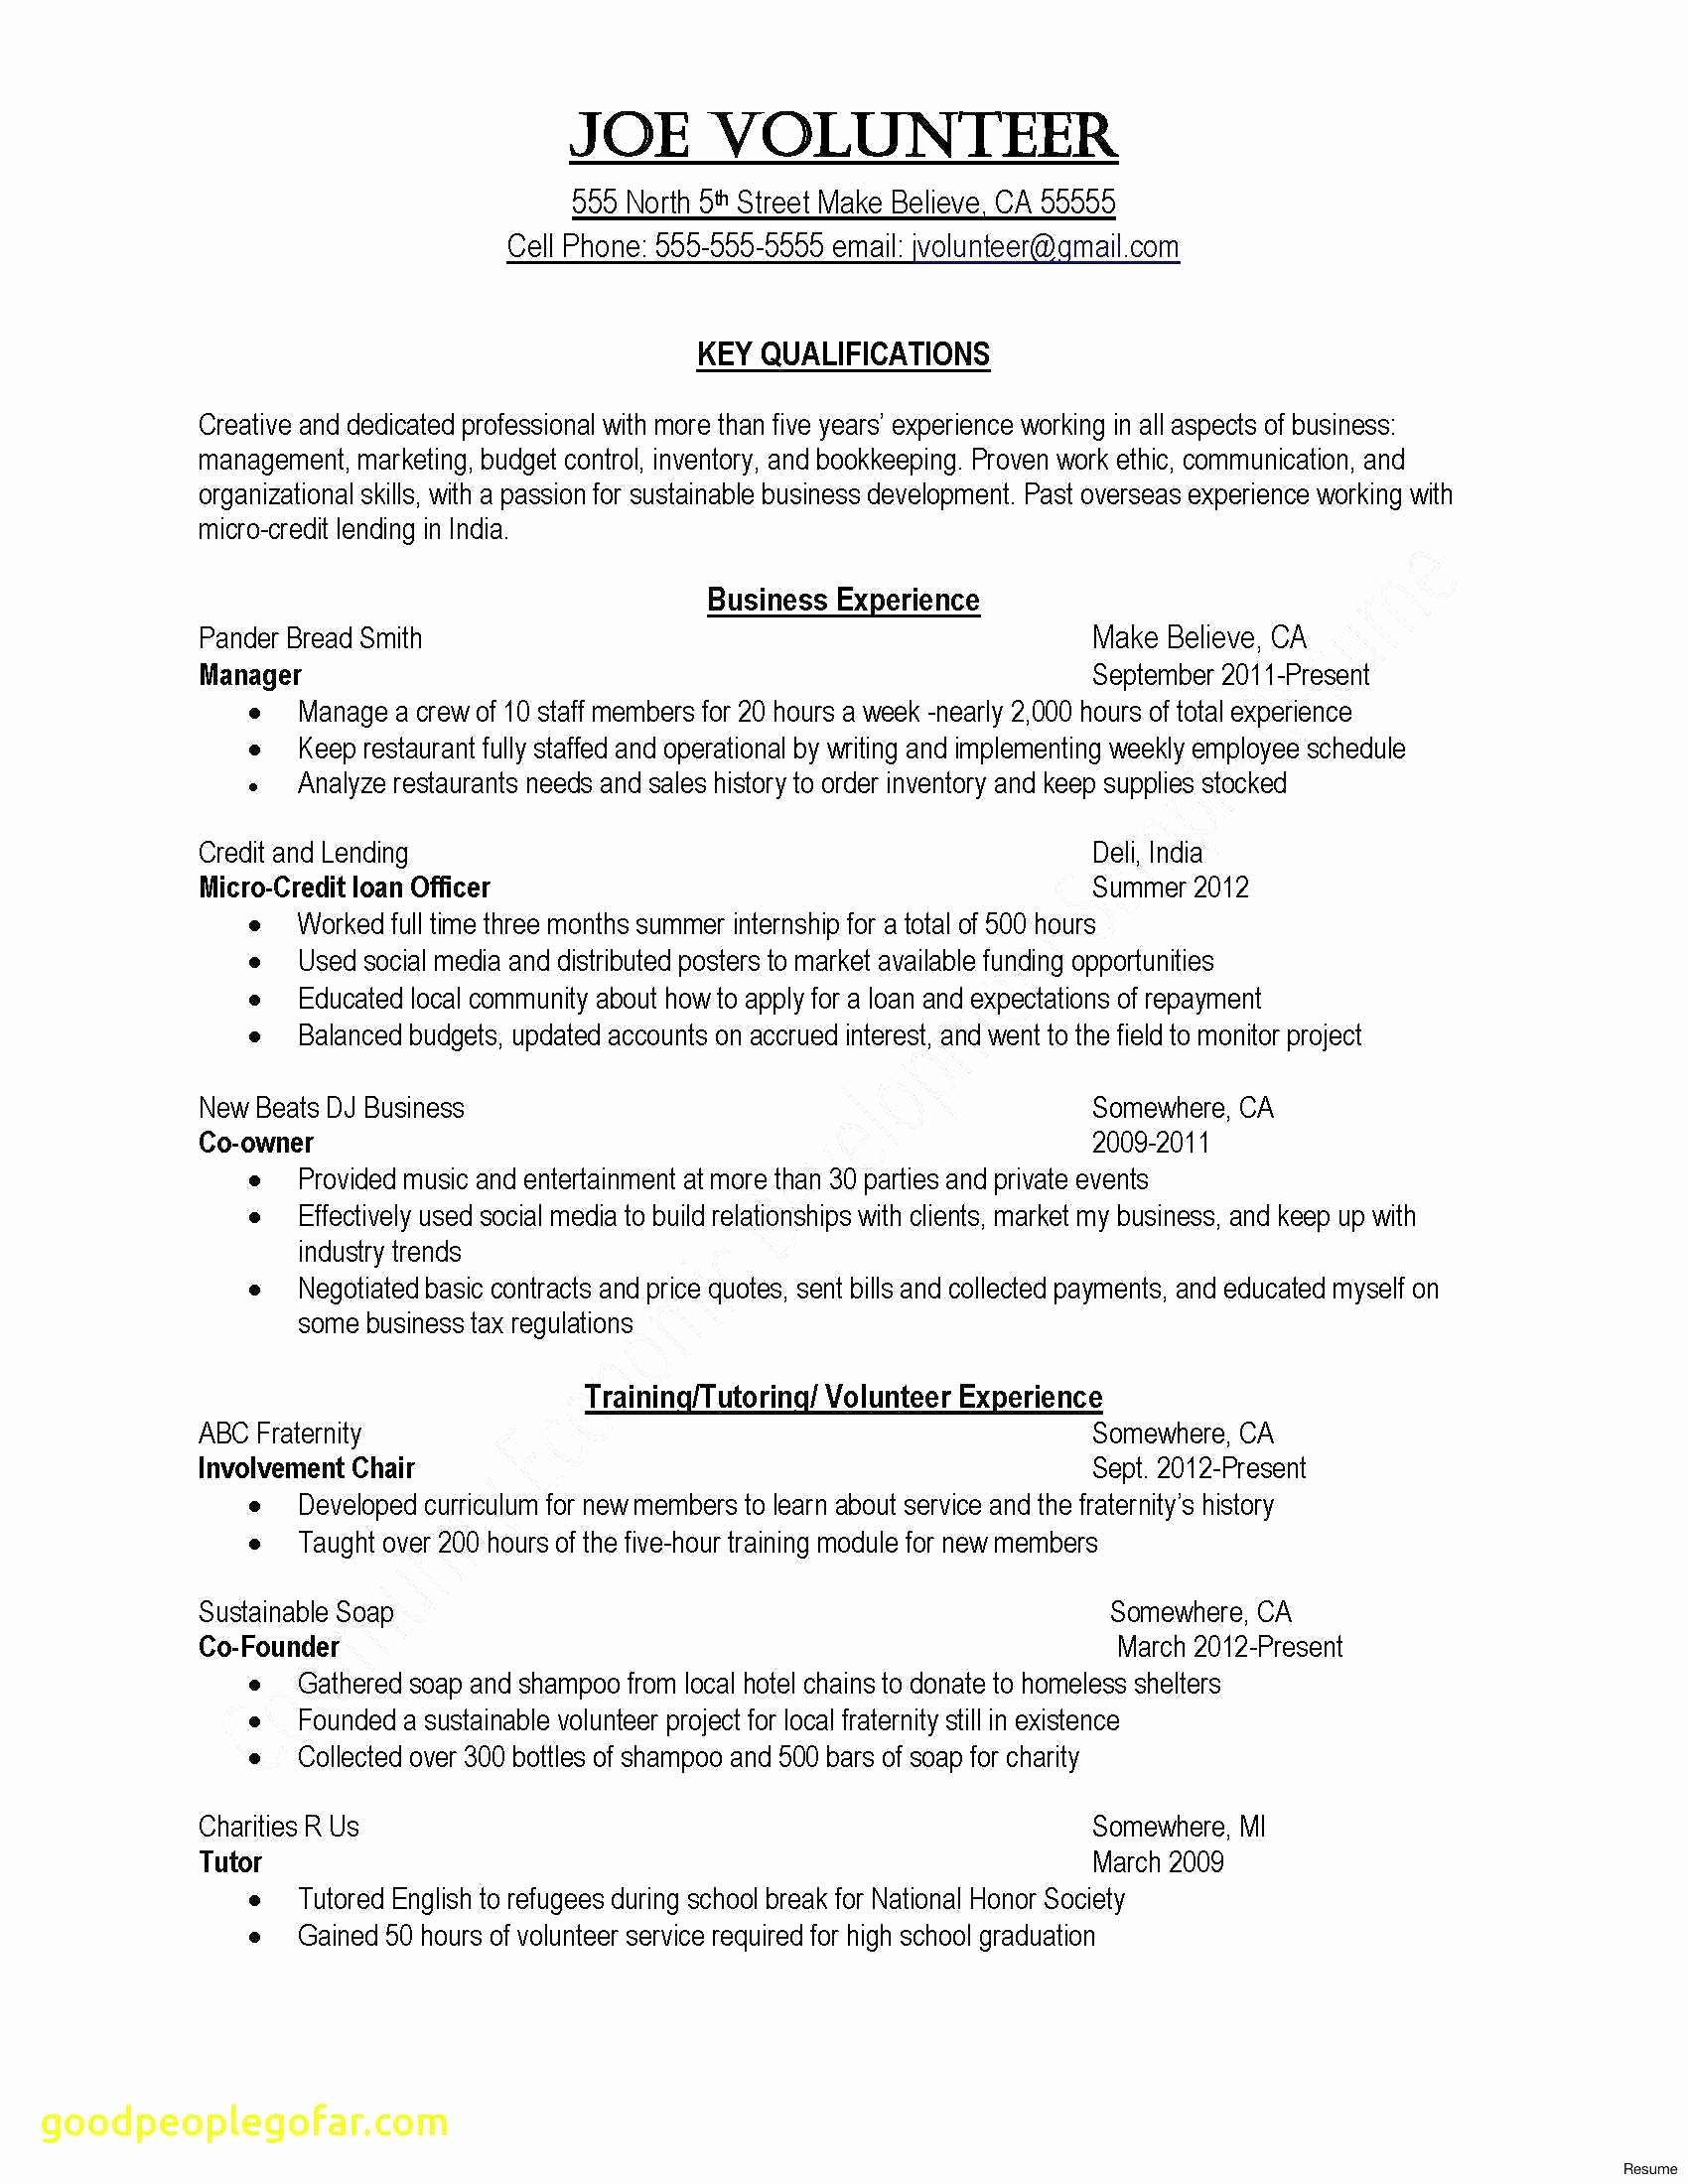 Volunteer Tracking Spreadsheet Template Intended For Volunteer Hours Log Template Excel New Munity Service Hours Log